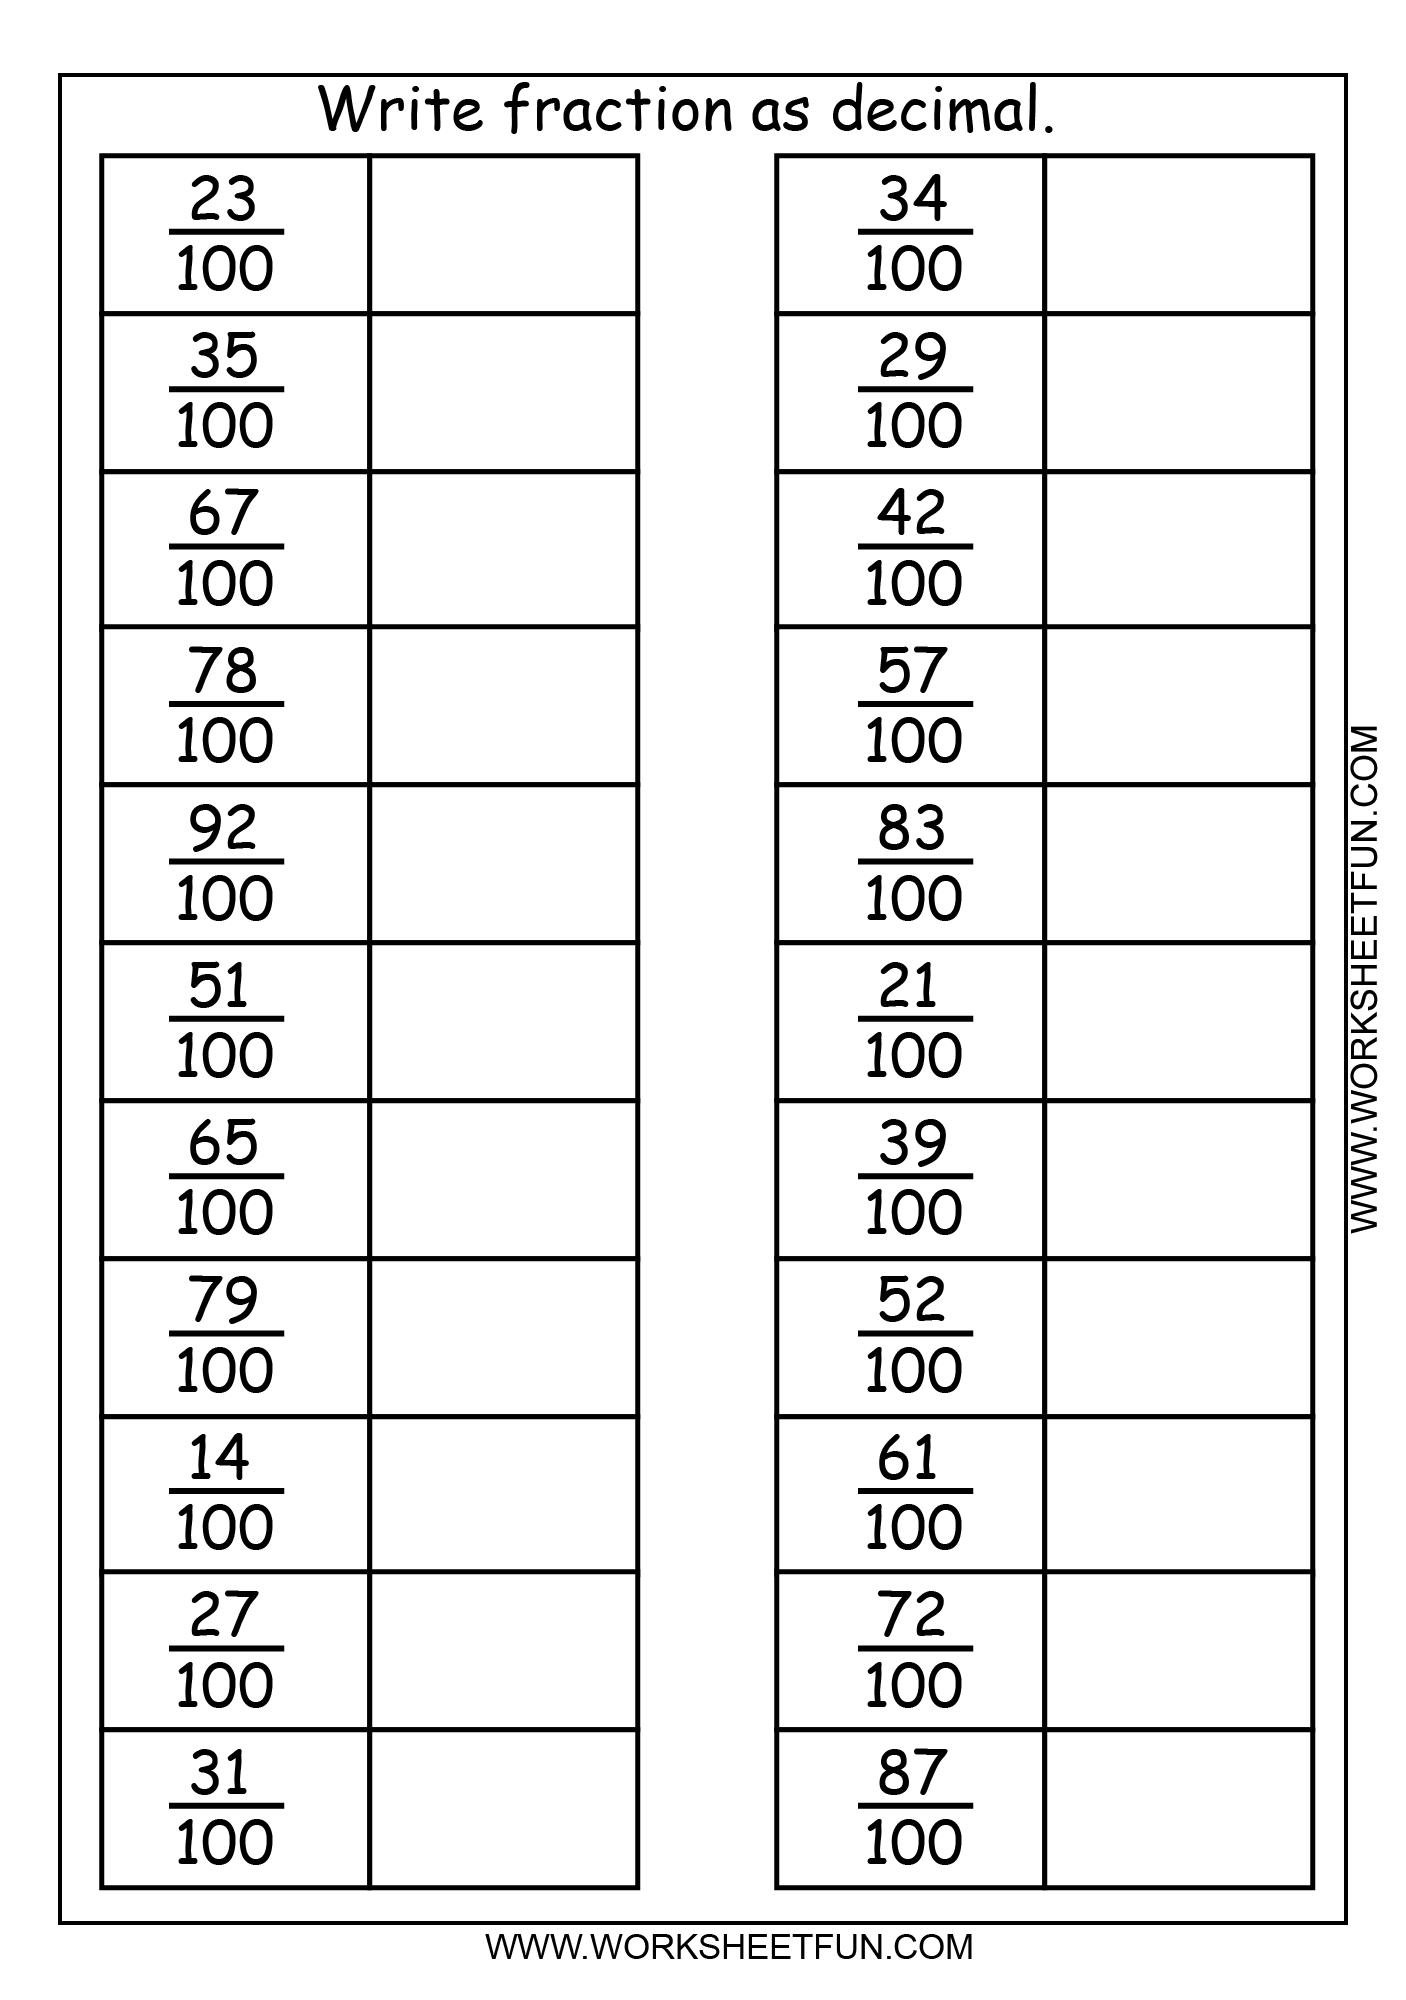 Write Fraction As Decimal 3 Worksheets Free Printable